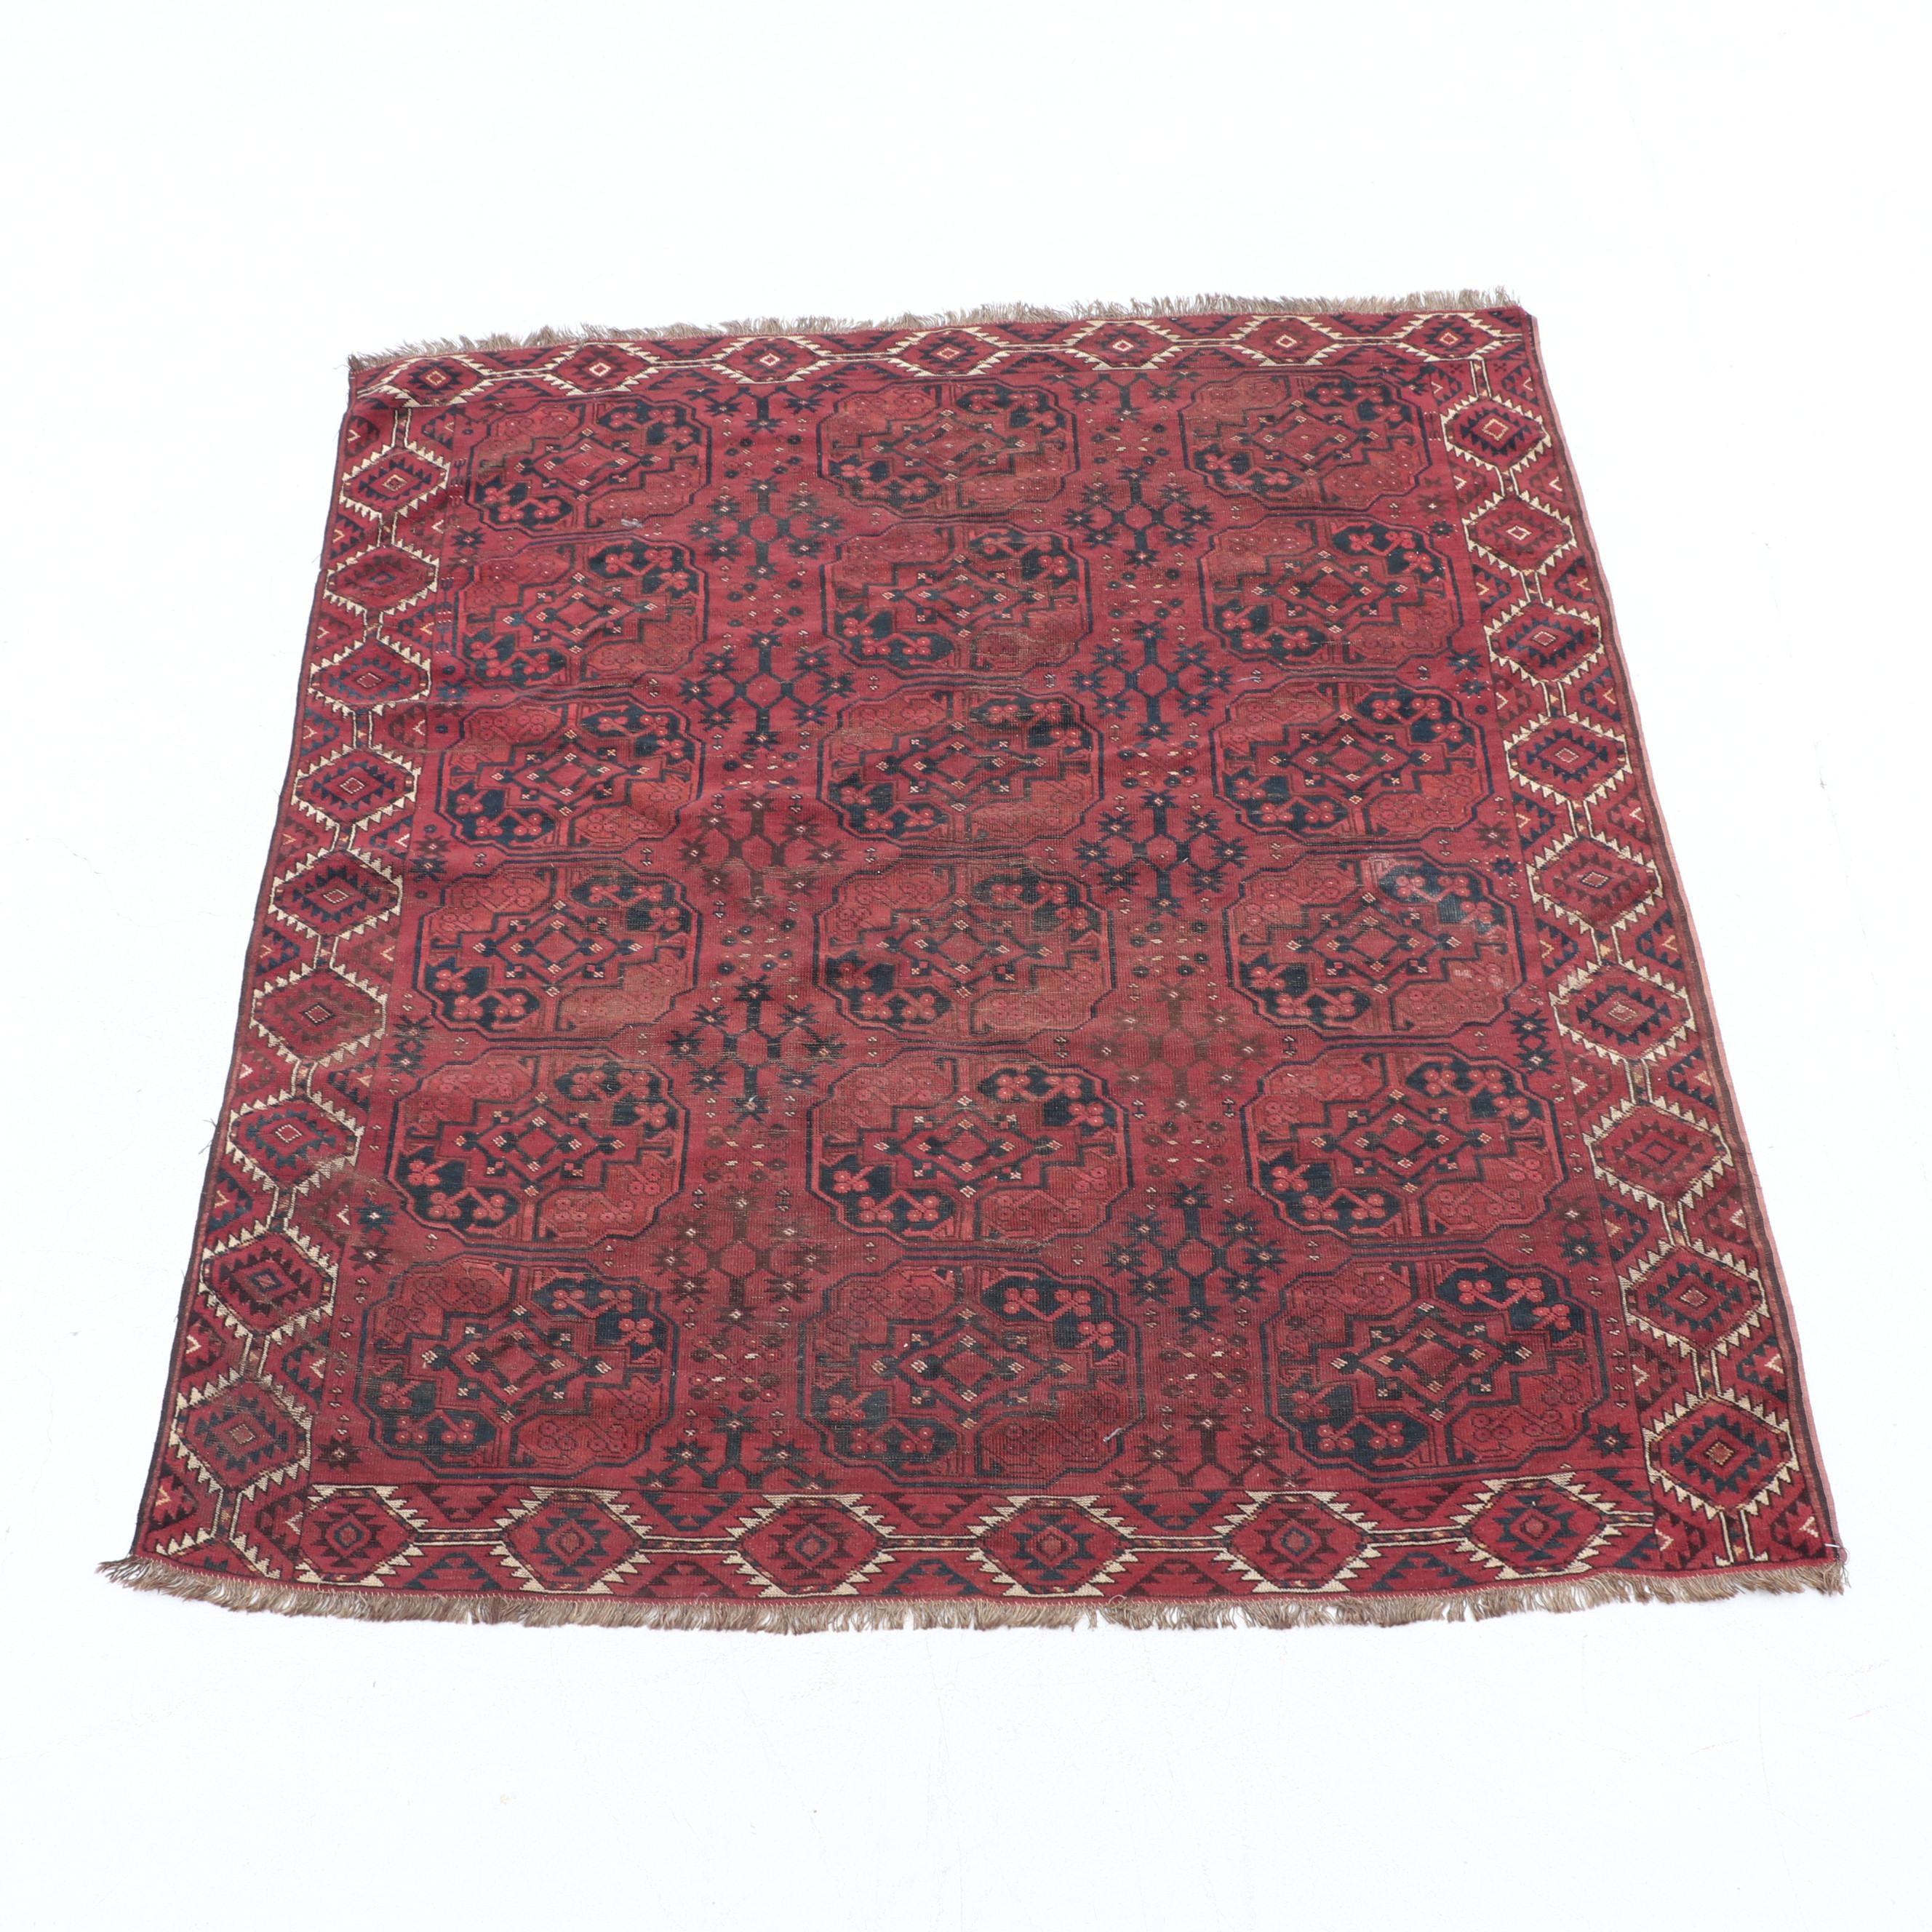 Hand-Knotted Turkoman Bokhara Wool Area Rug